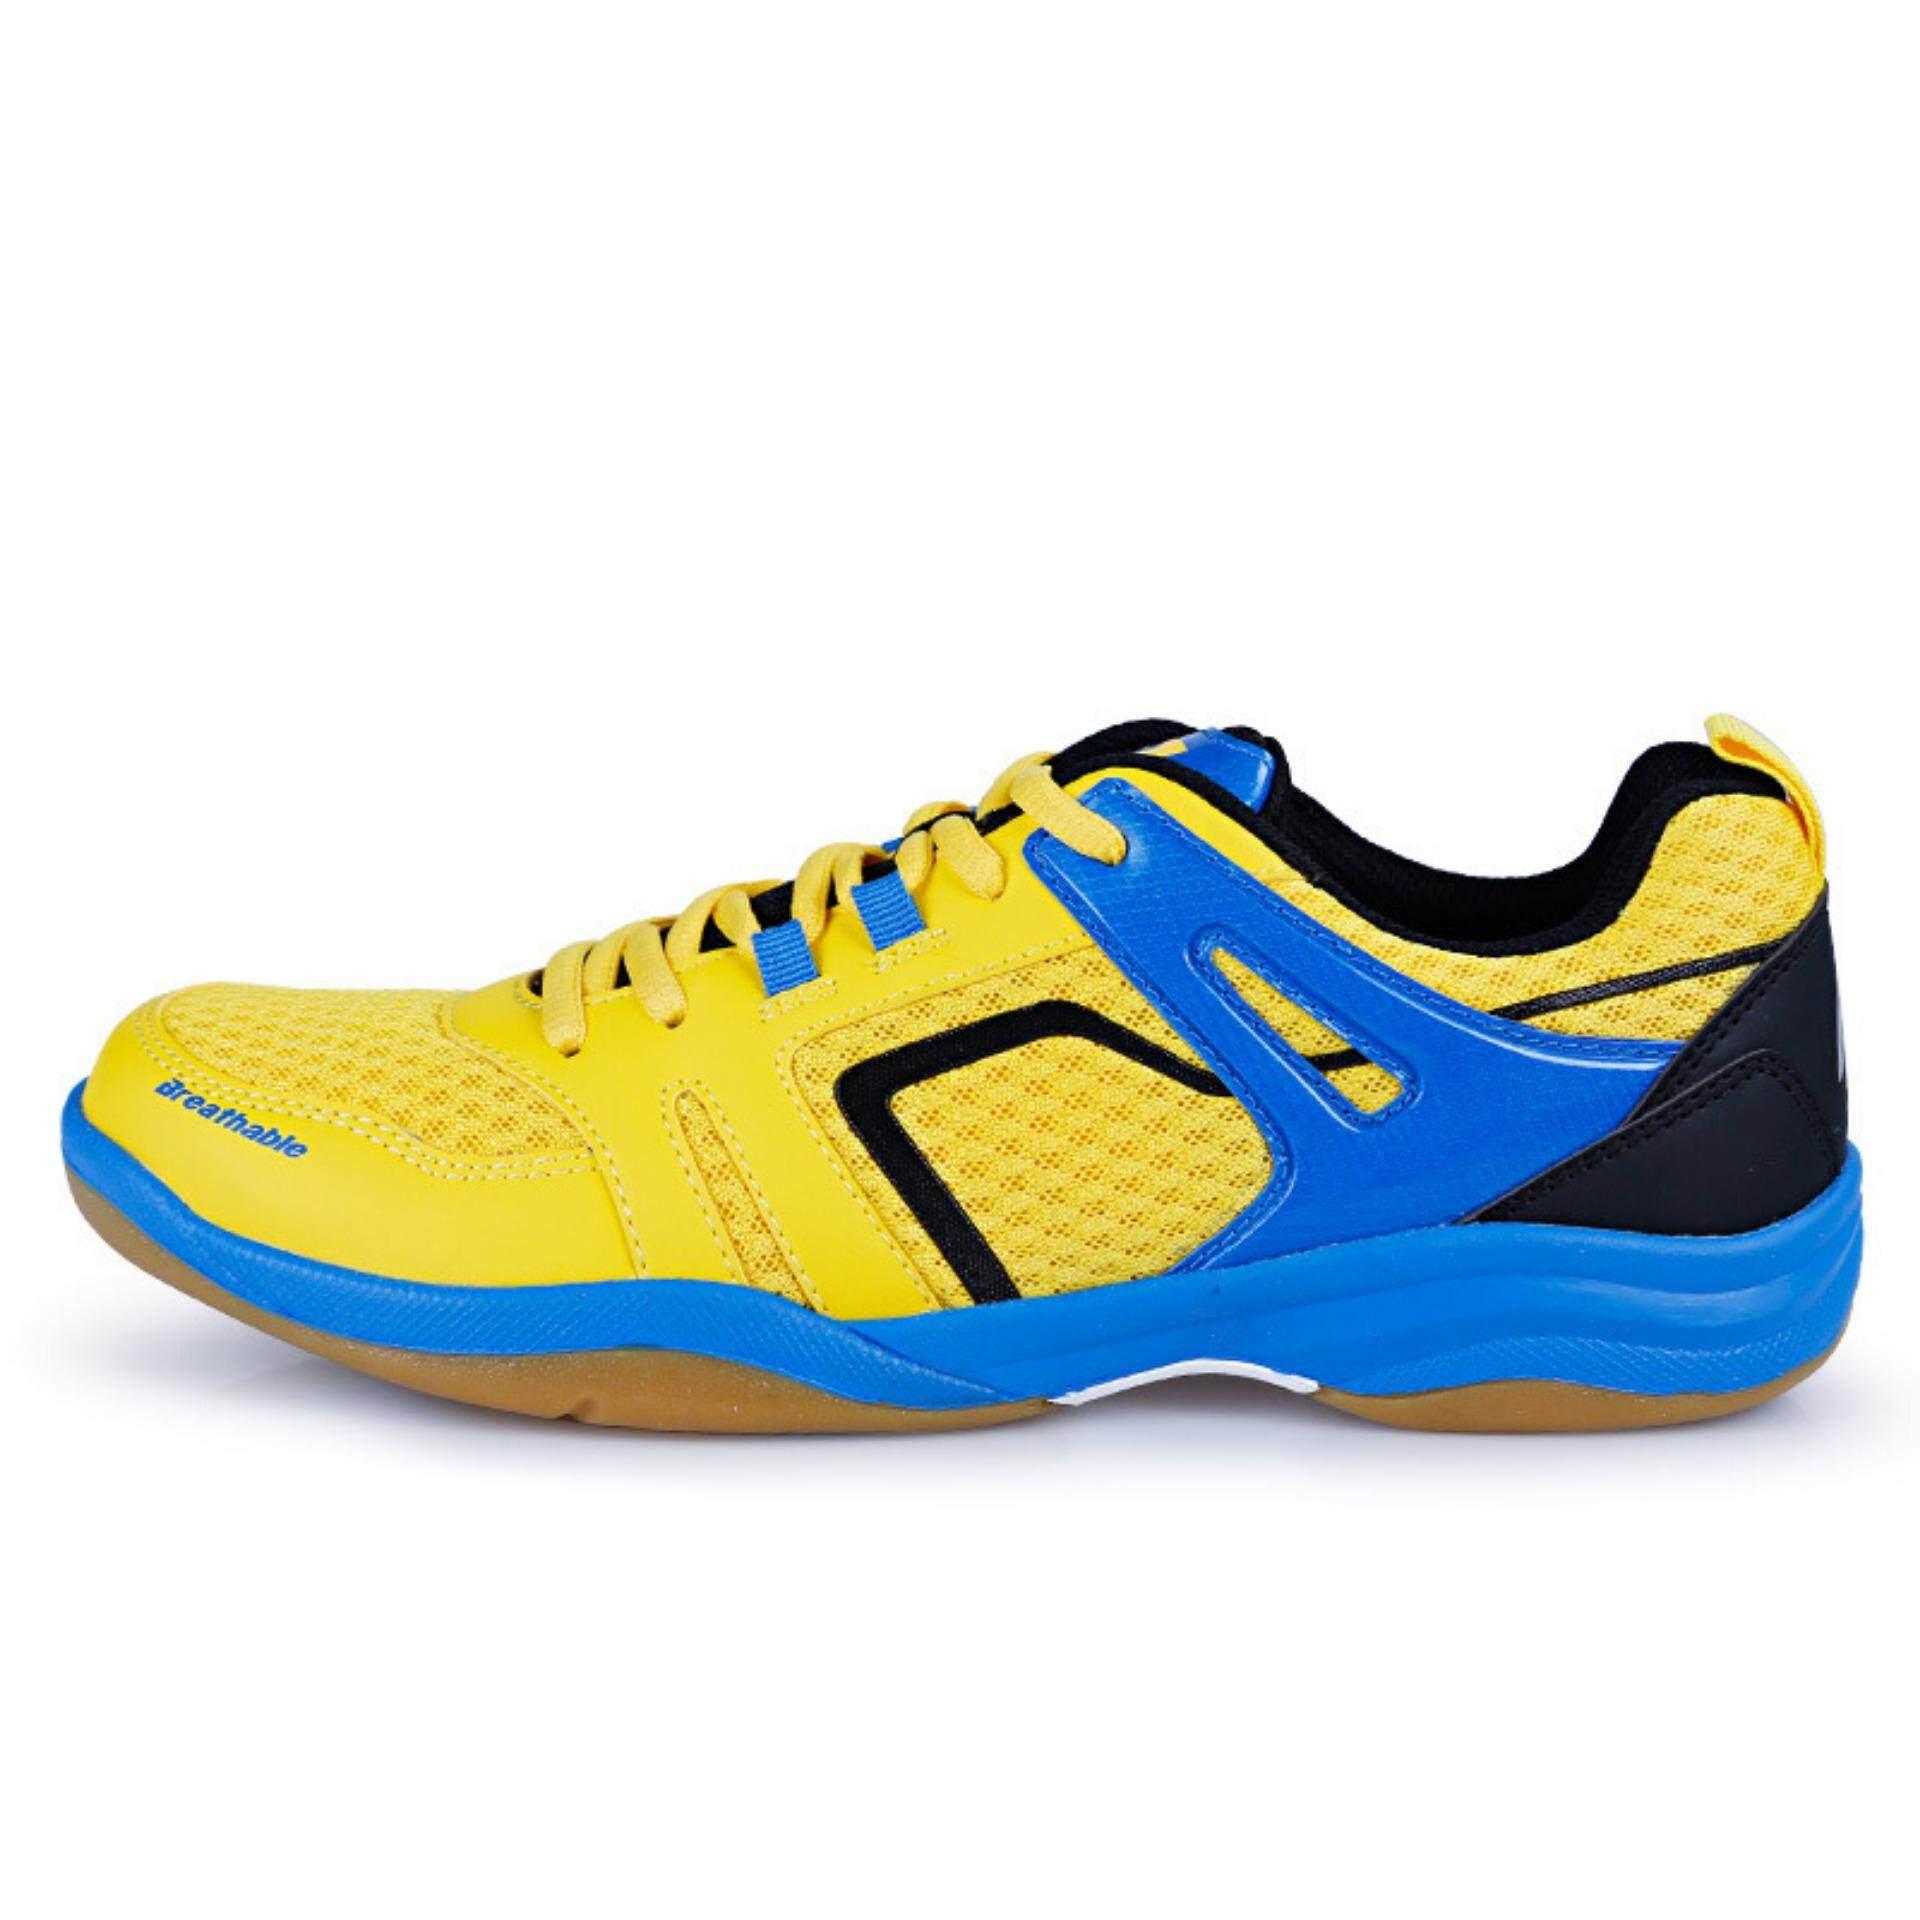 HEAD Original Badminton Shoes Breathable Non Slip Brand Tennis Shoes - intl